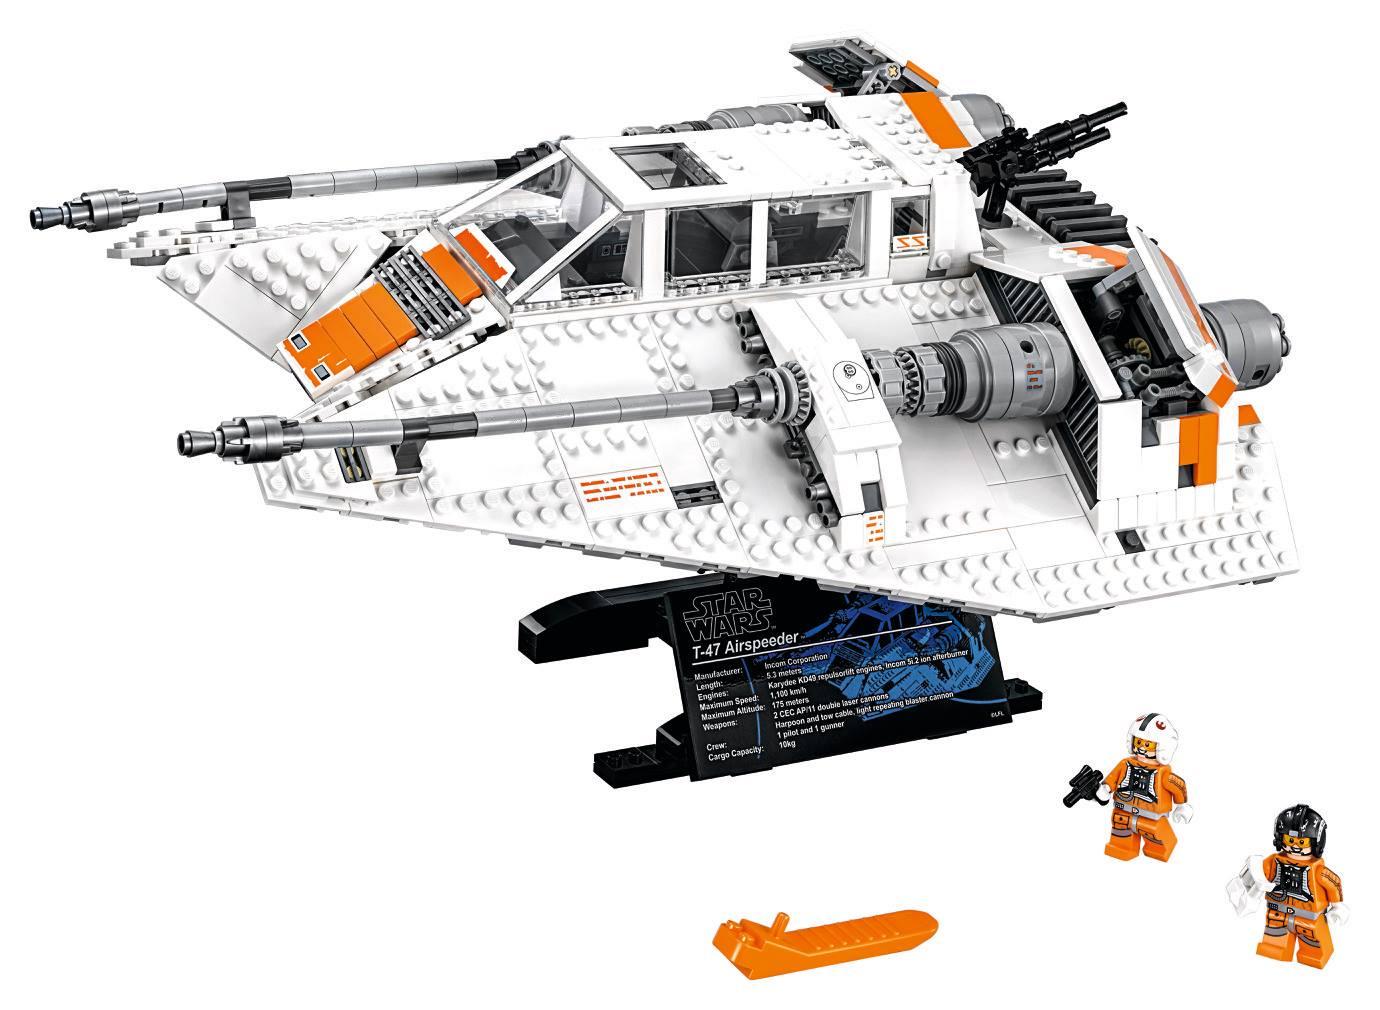 LEGO Star Wars Snowspeeder 75144 Back In-Stock On LEGO Shop